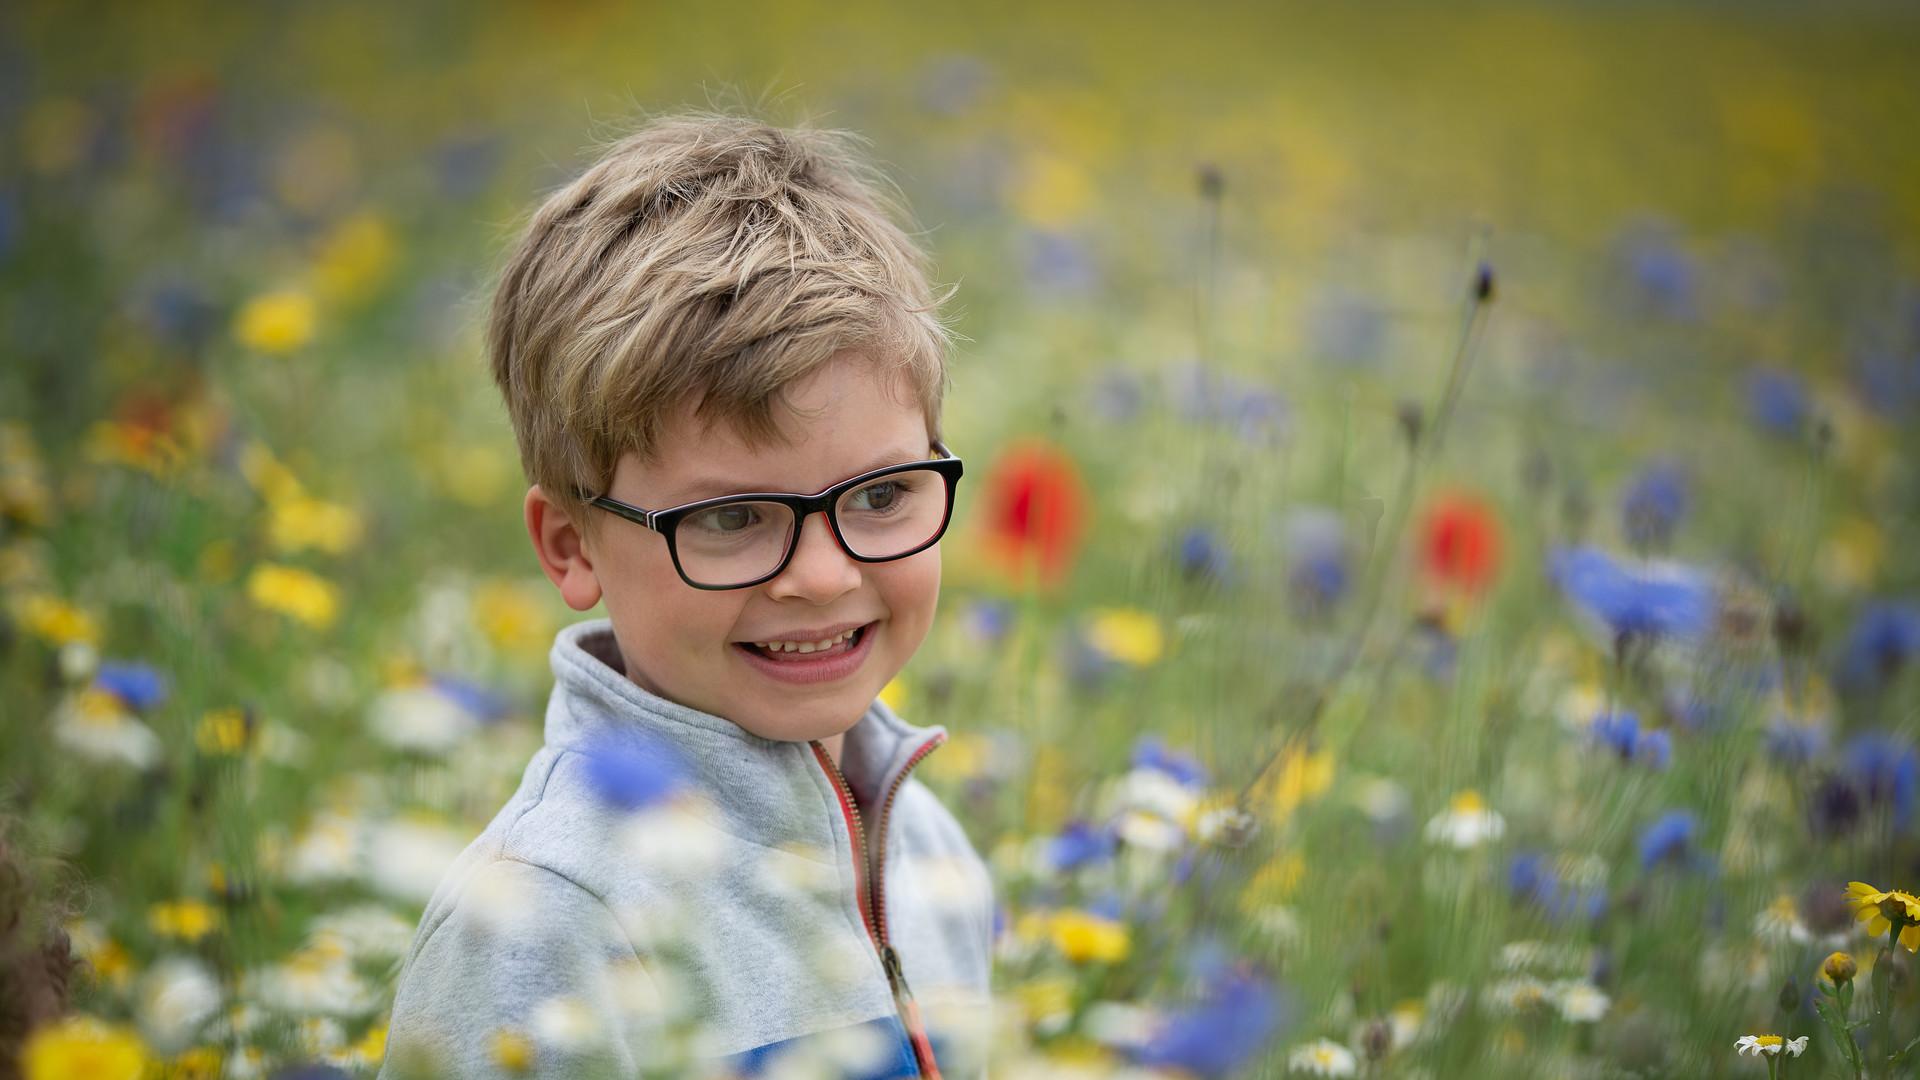 boy among wildflowers.jpg